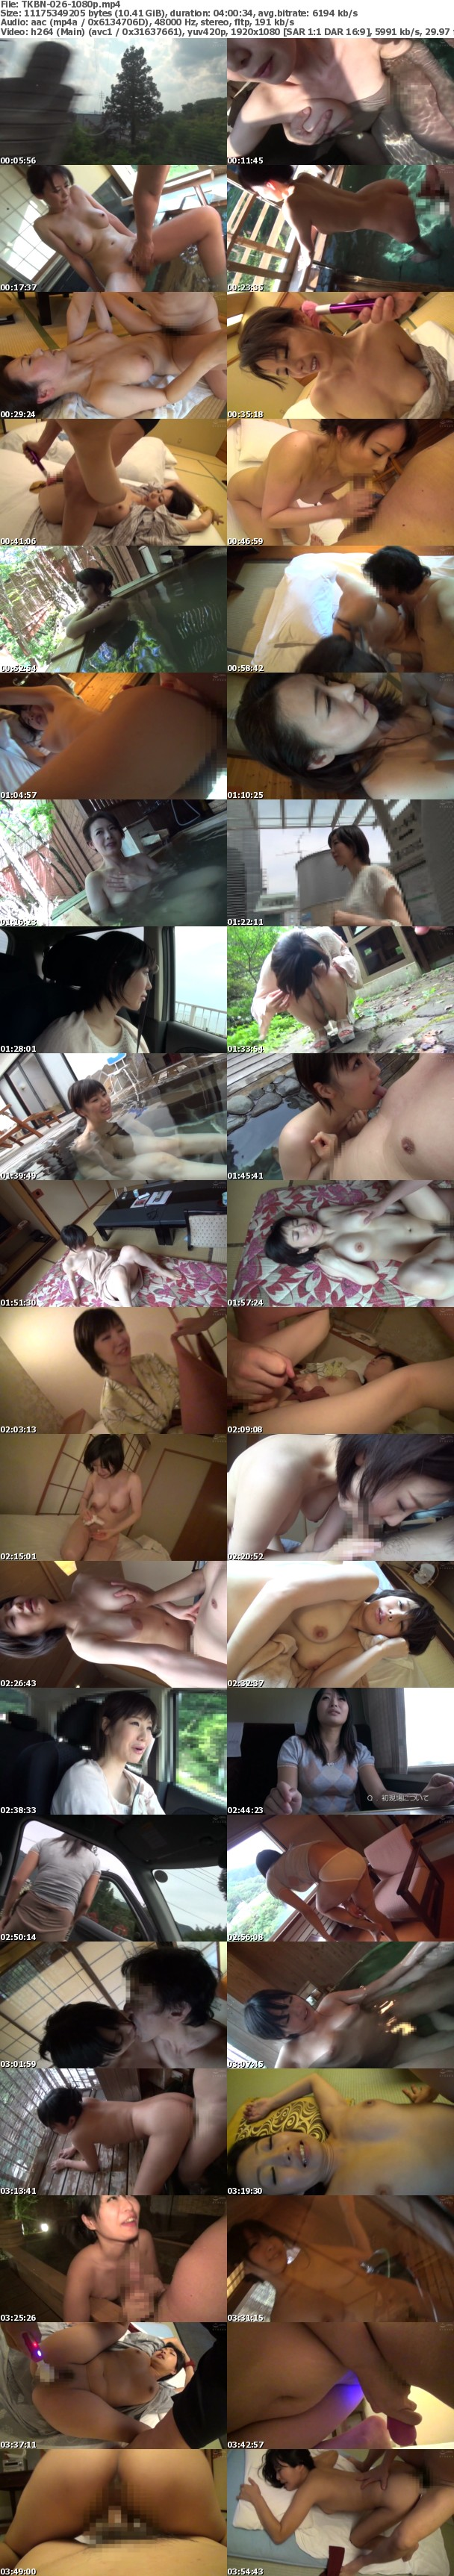 (Full HD) TKBN-026 本性さらす不倫旅 三浦恵理子 森ななこ 山本美和子